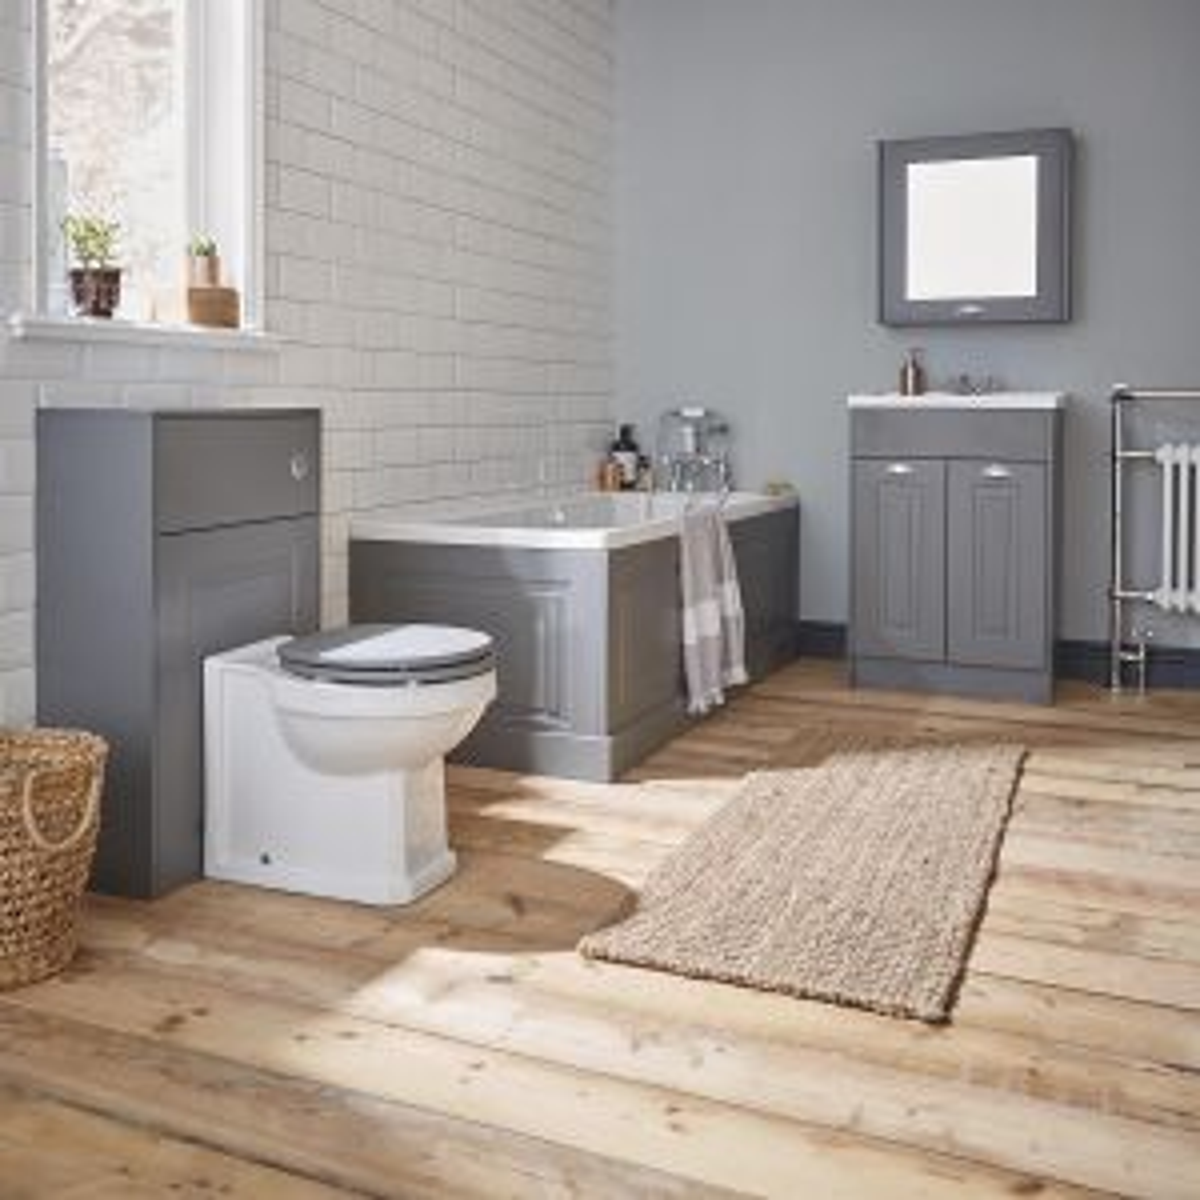 Kartell Astley Matt White Soft Close Toilet Seat Lifestyle